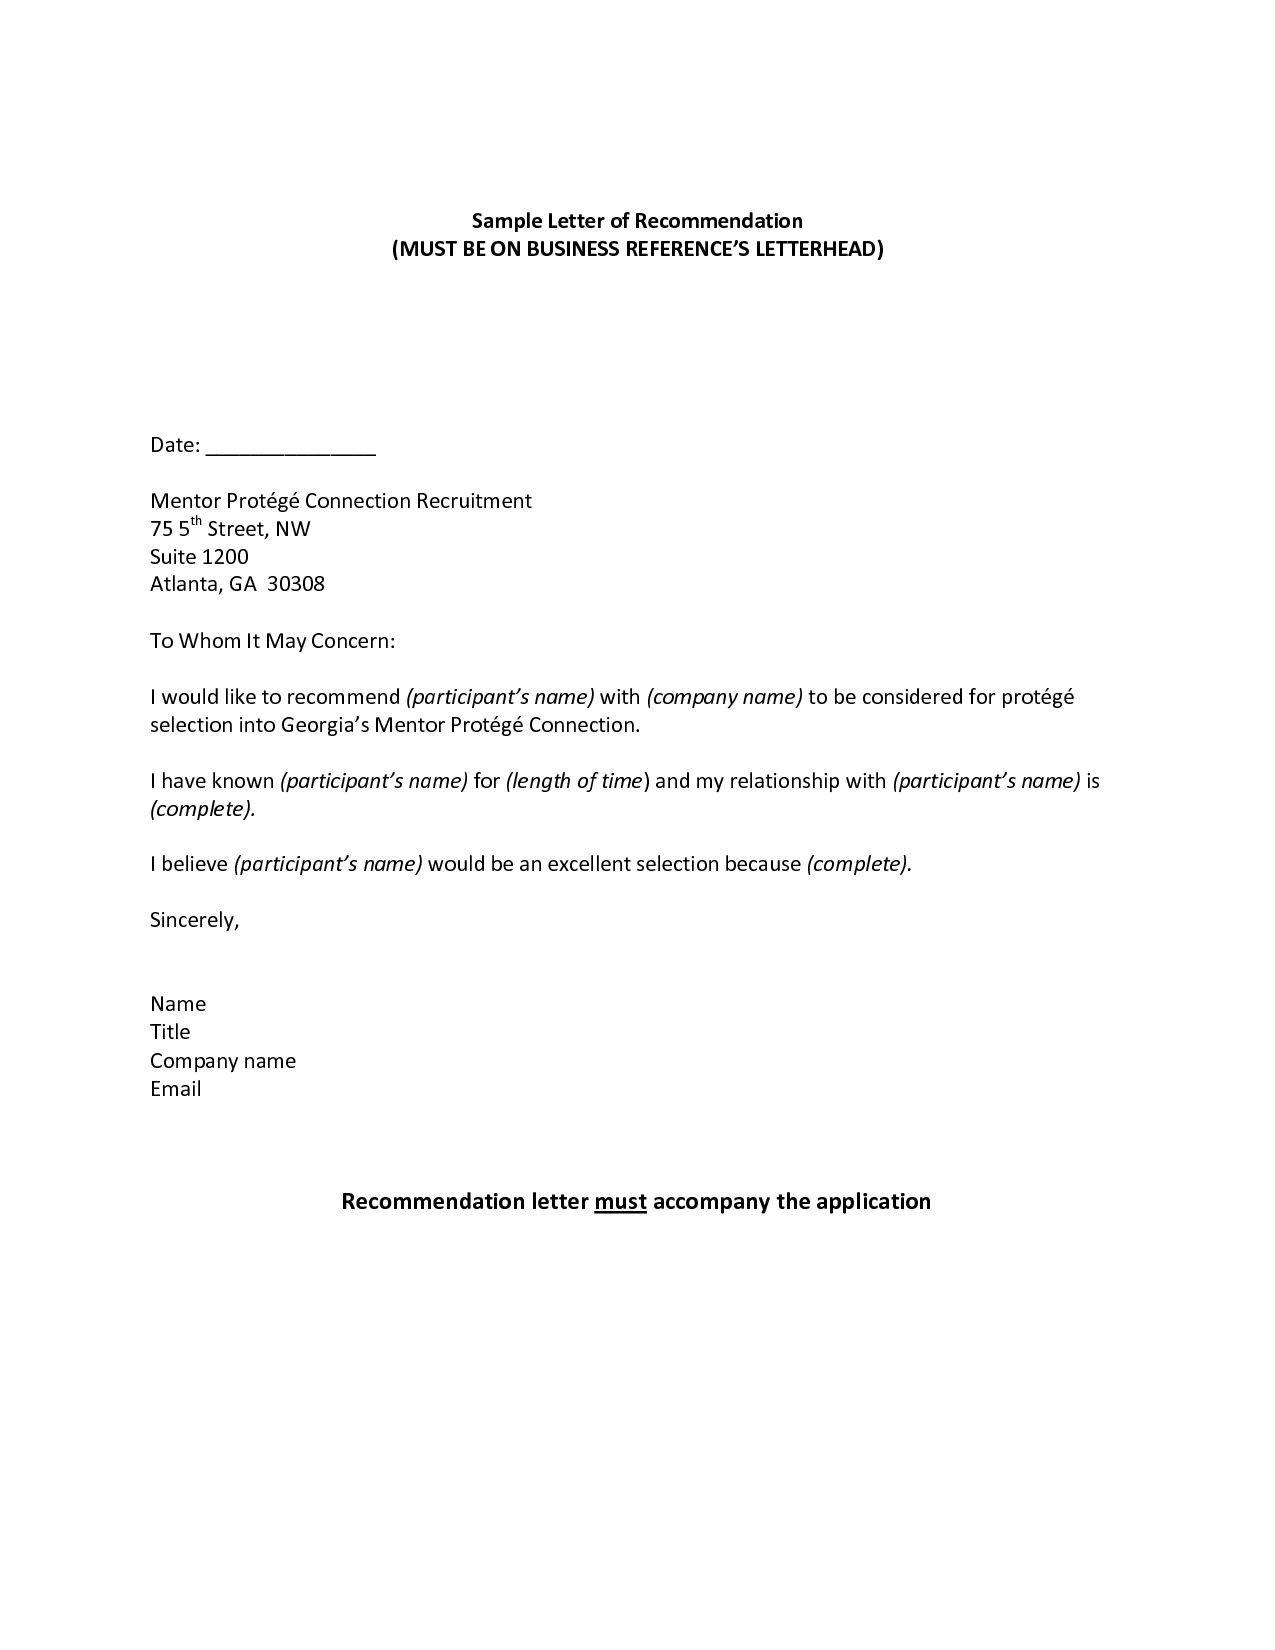 Professional Reference Sample Recommendation Letter Jos Inside Business Reference Letter Template Word Reference Letter Template Professional Reference Letter